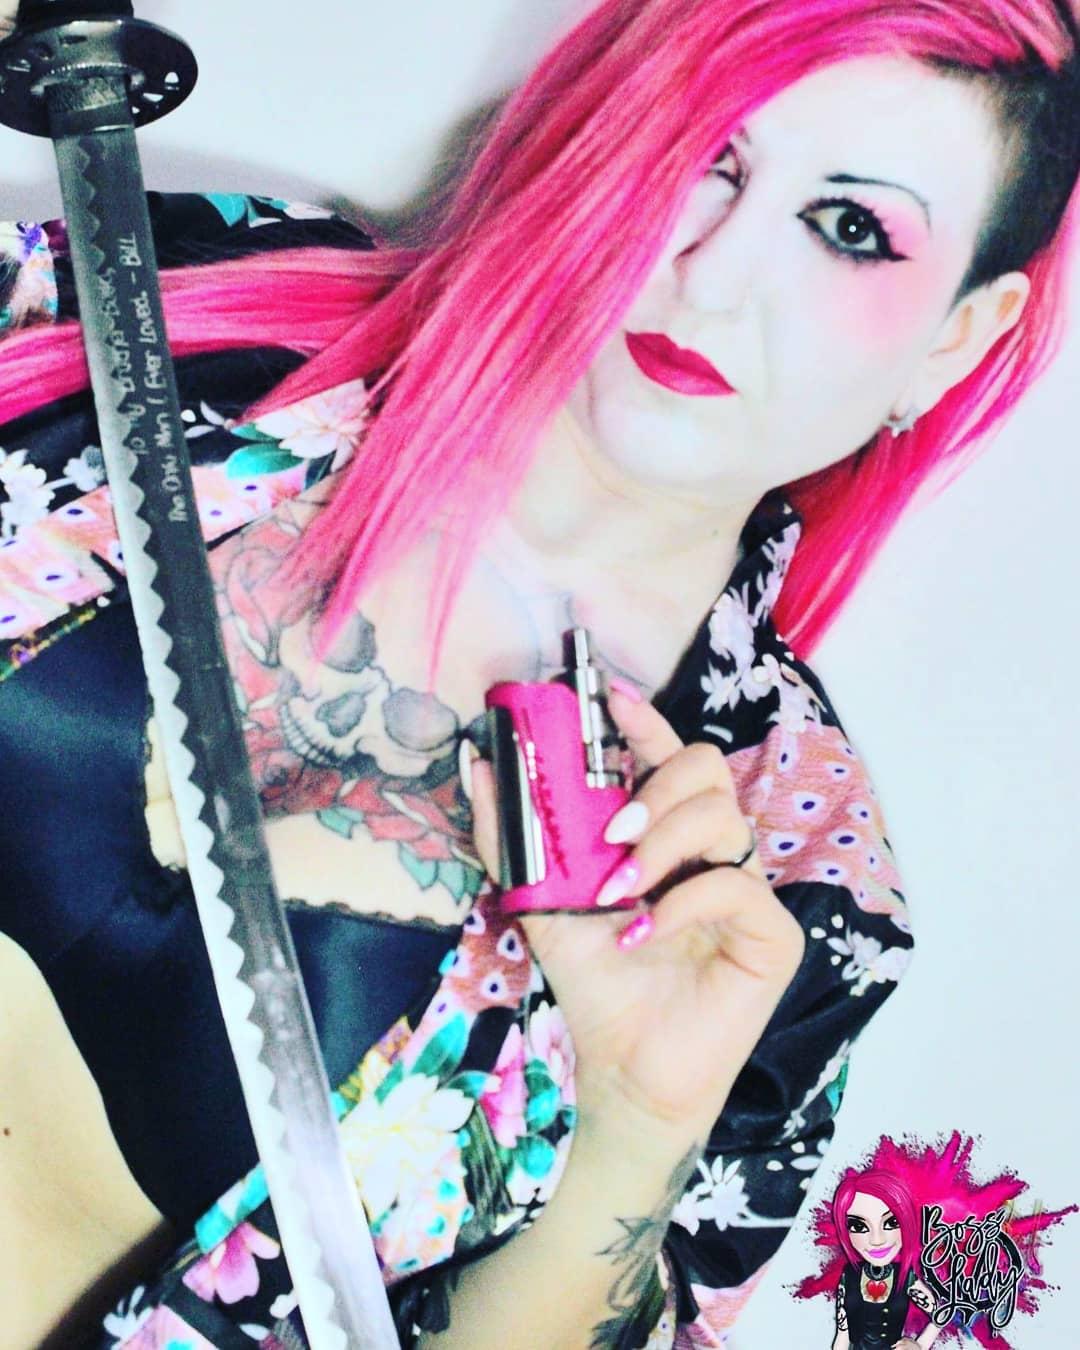 Boss Lady Vaper Instagram – 2019-01-20 13:55:58 1584785073 313 49836598 2268555083176766 448727356961448761 n